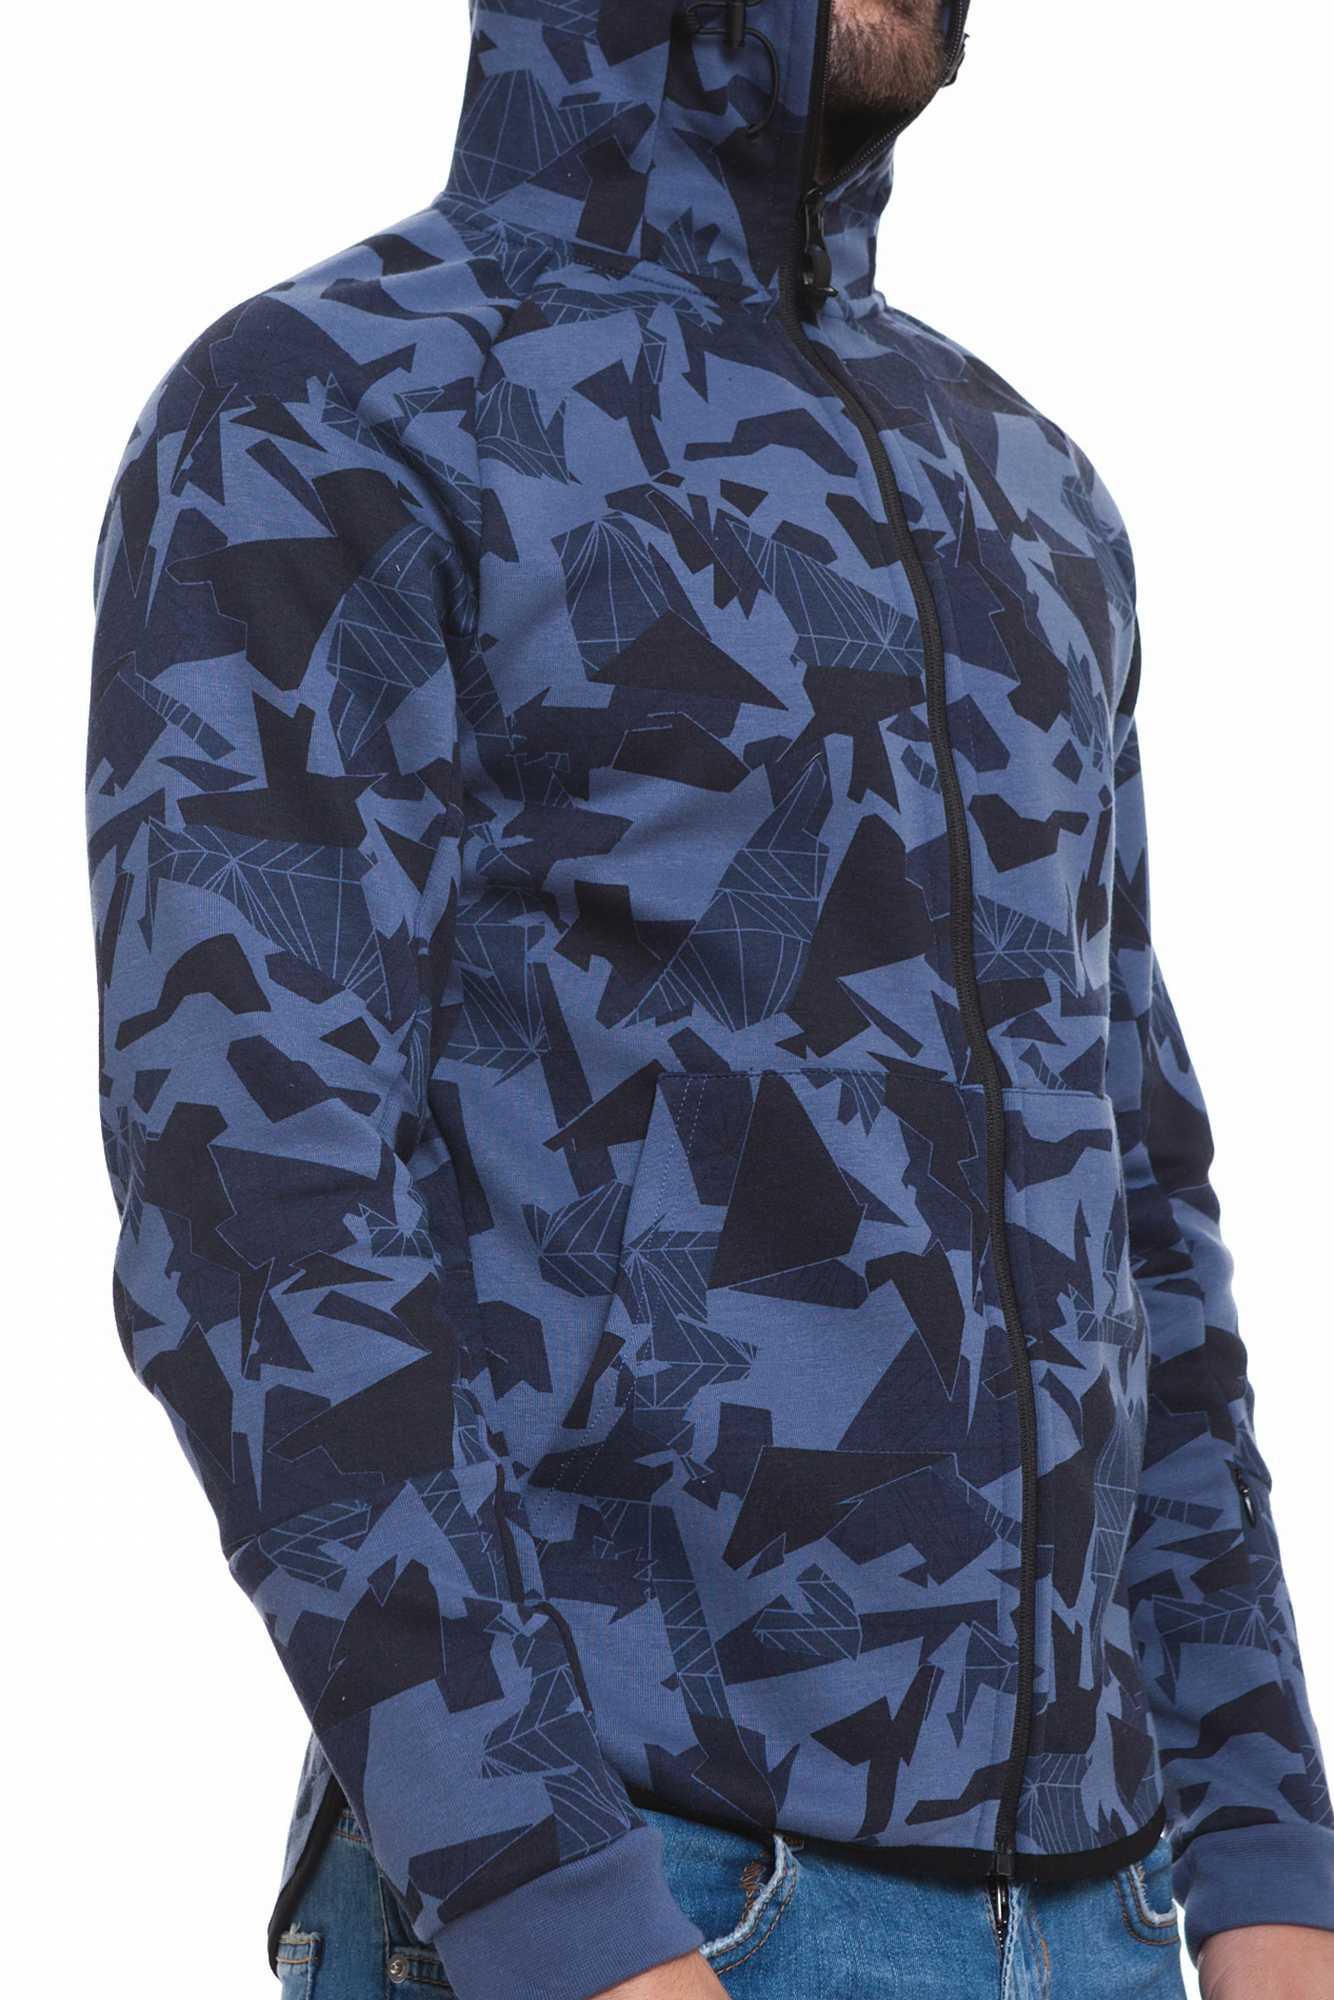 Born богатый балателли свитер для мужчин темно синий спортивный BR2E111087AA2BRC 2 - 4